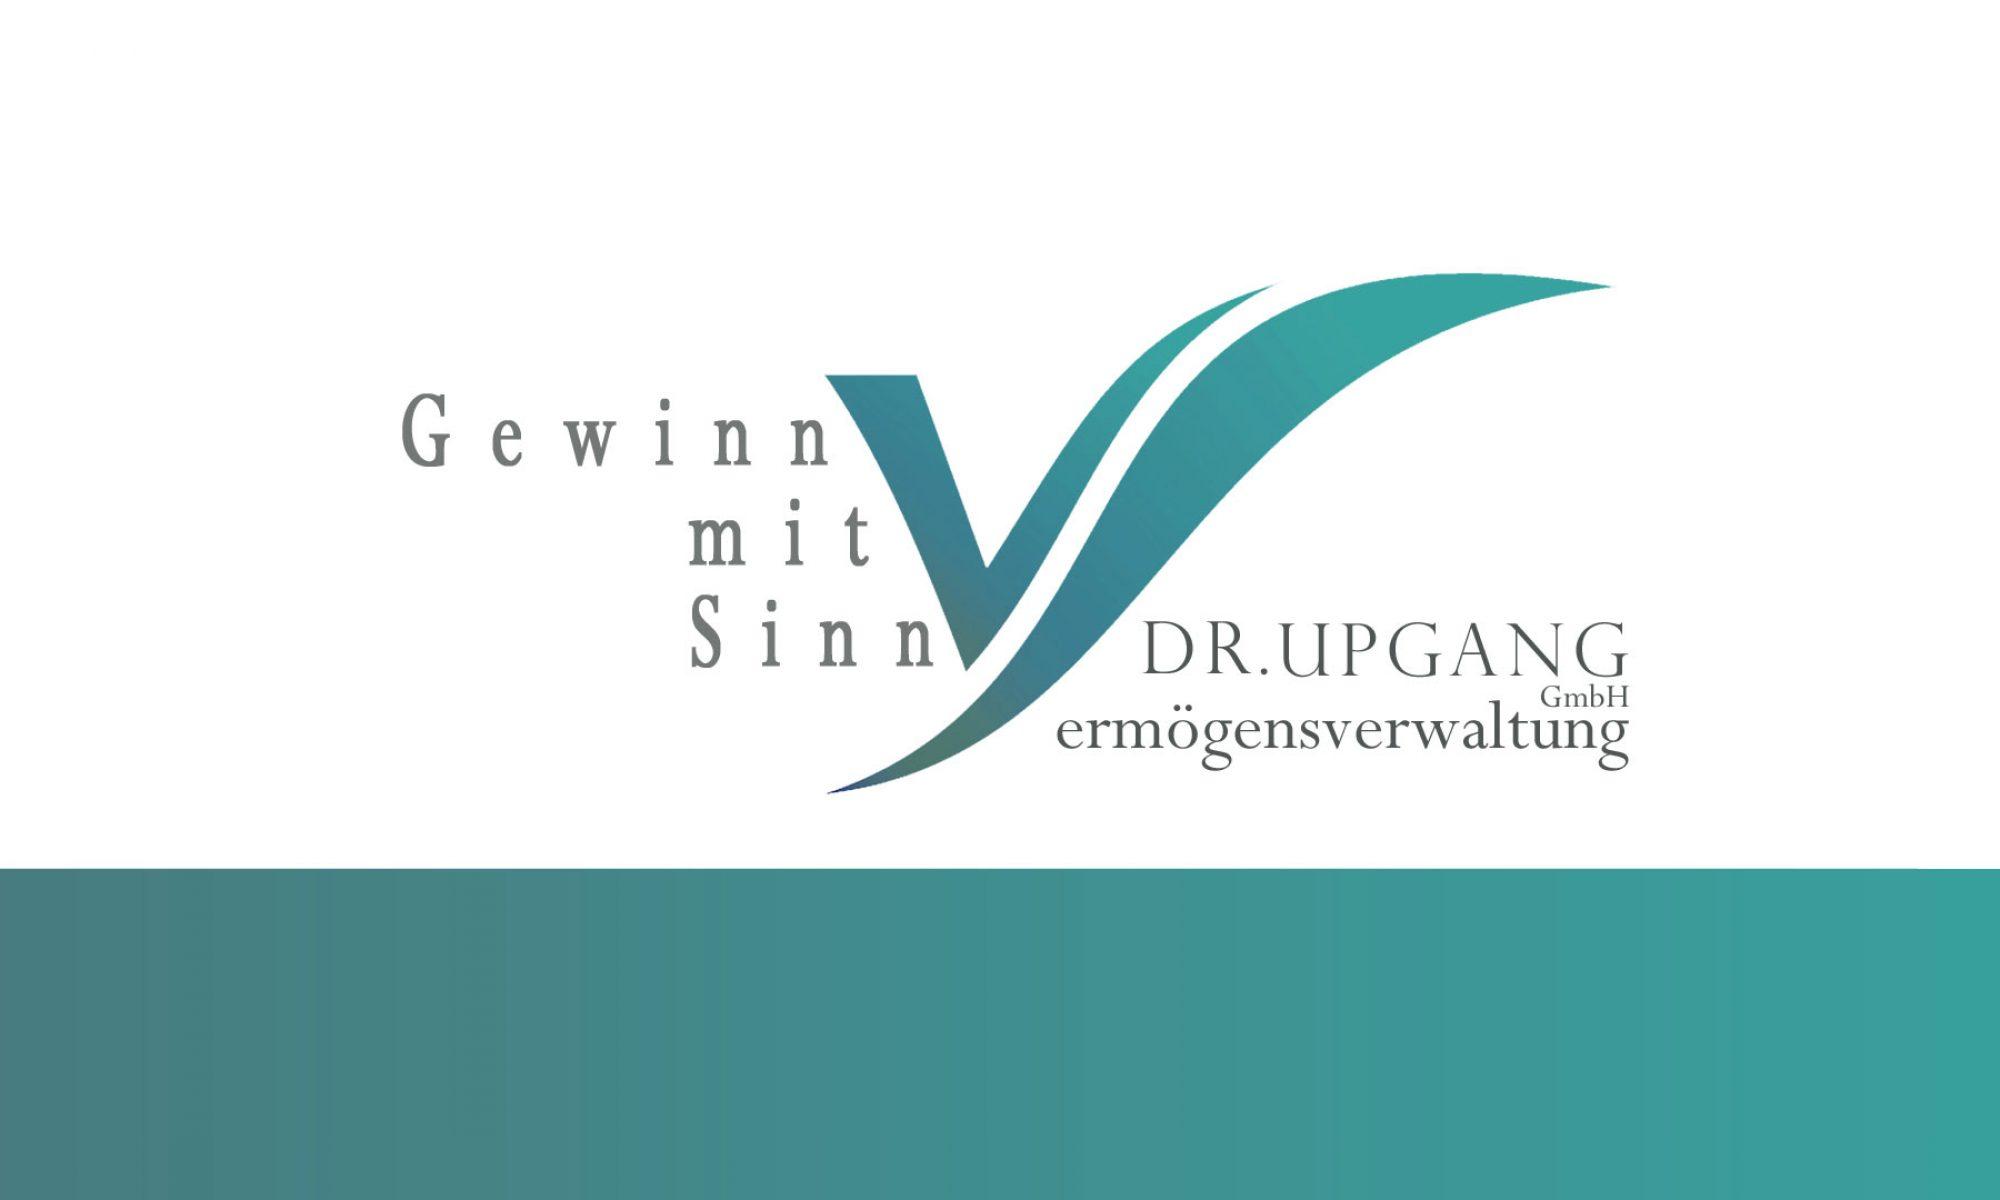 Dr. Upgang Vermögensverwaltung